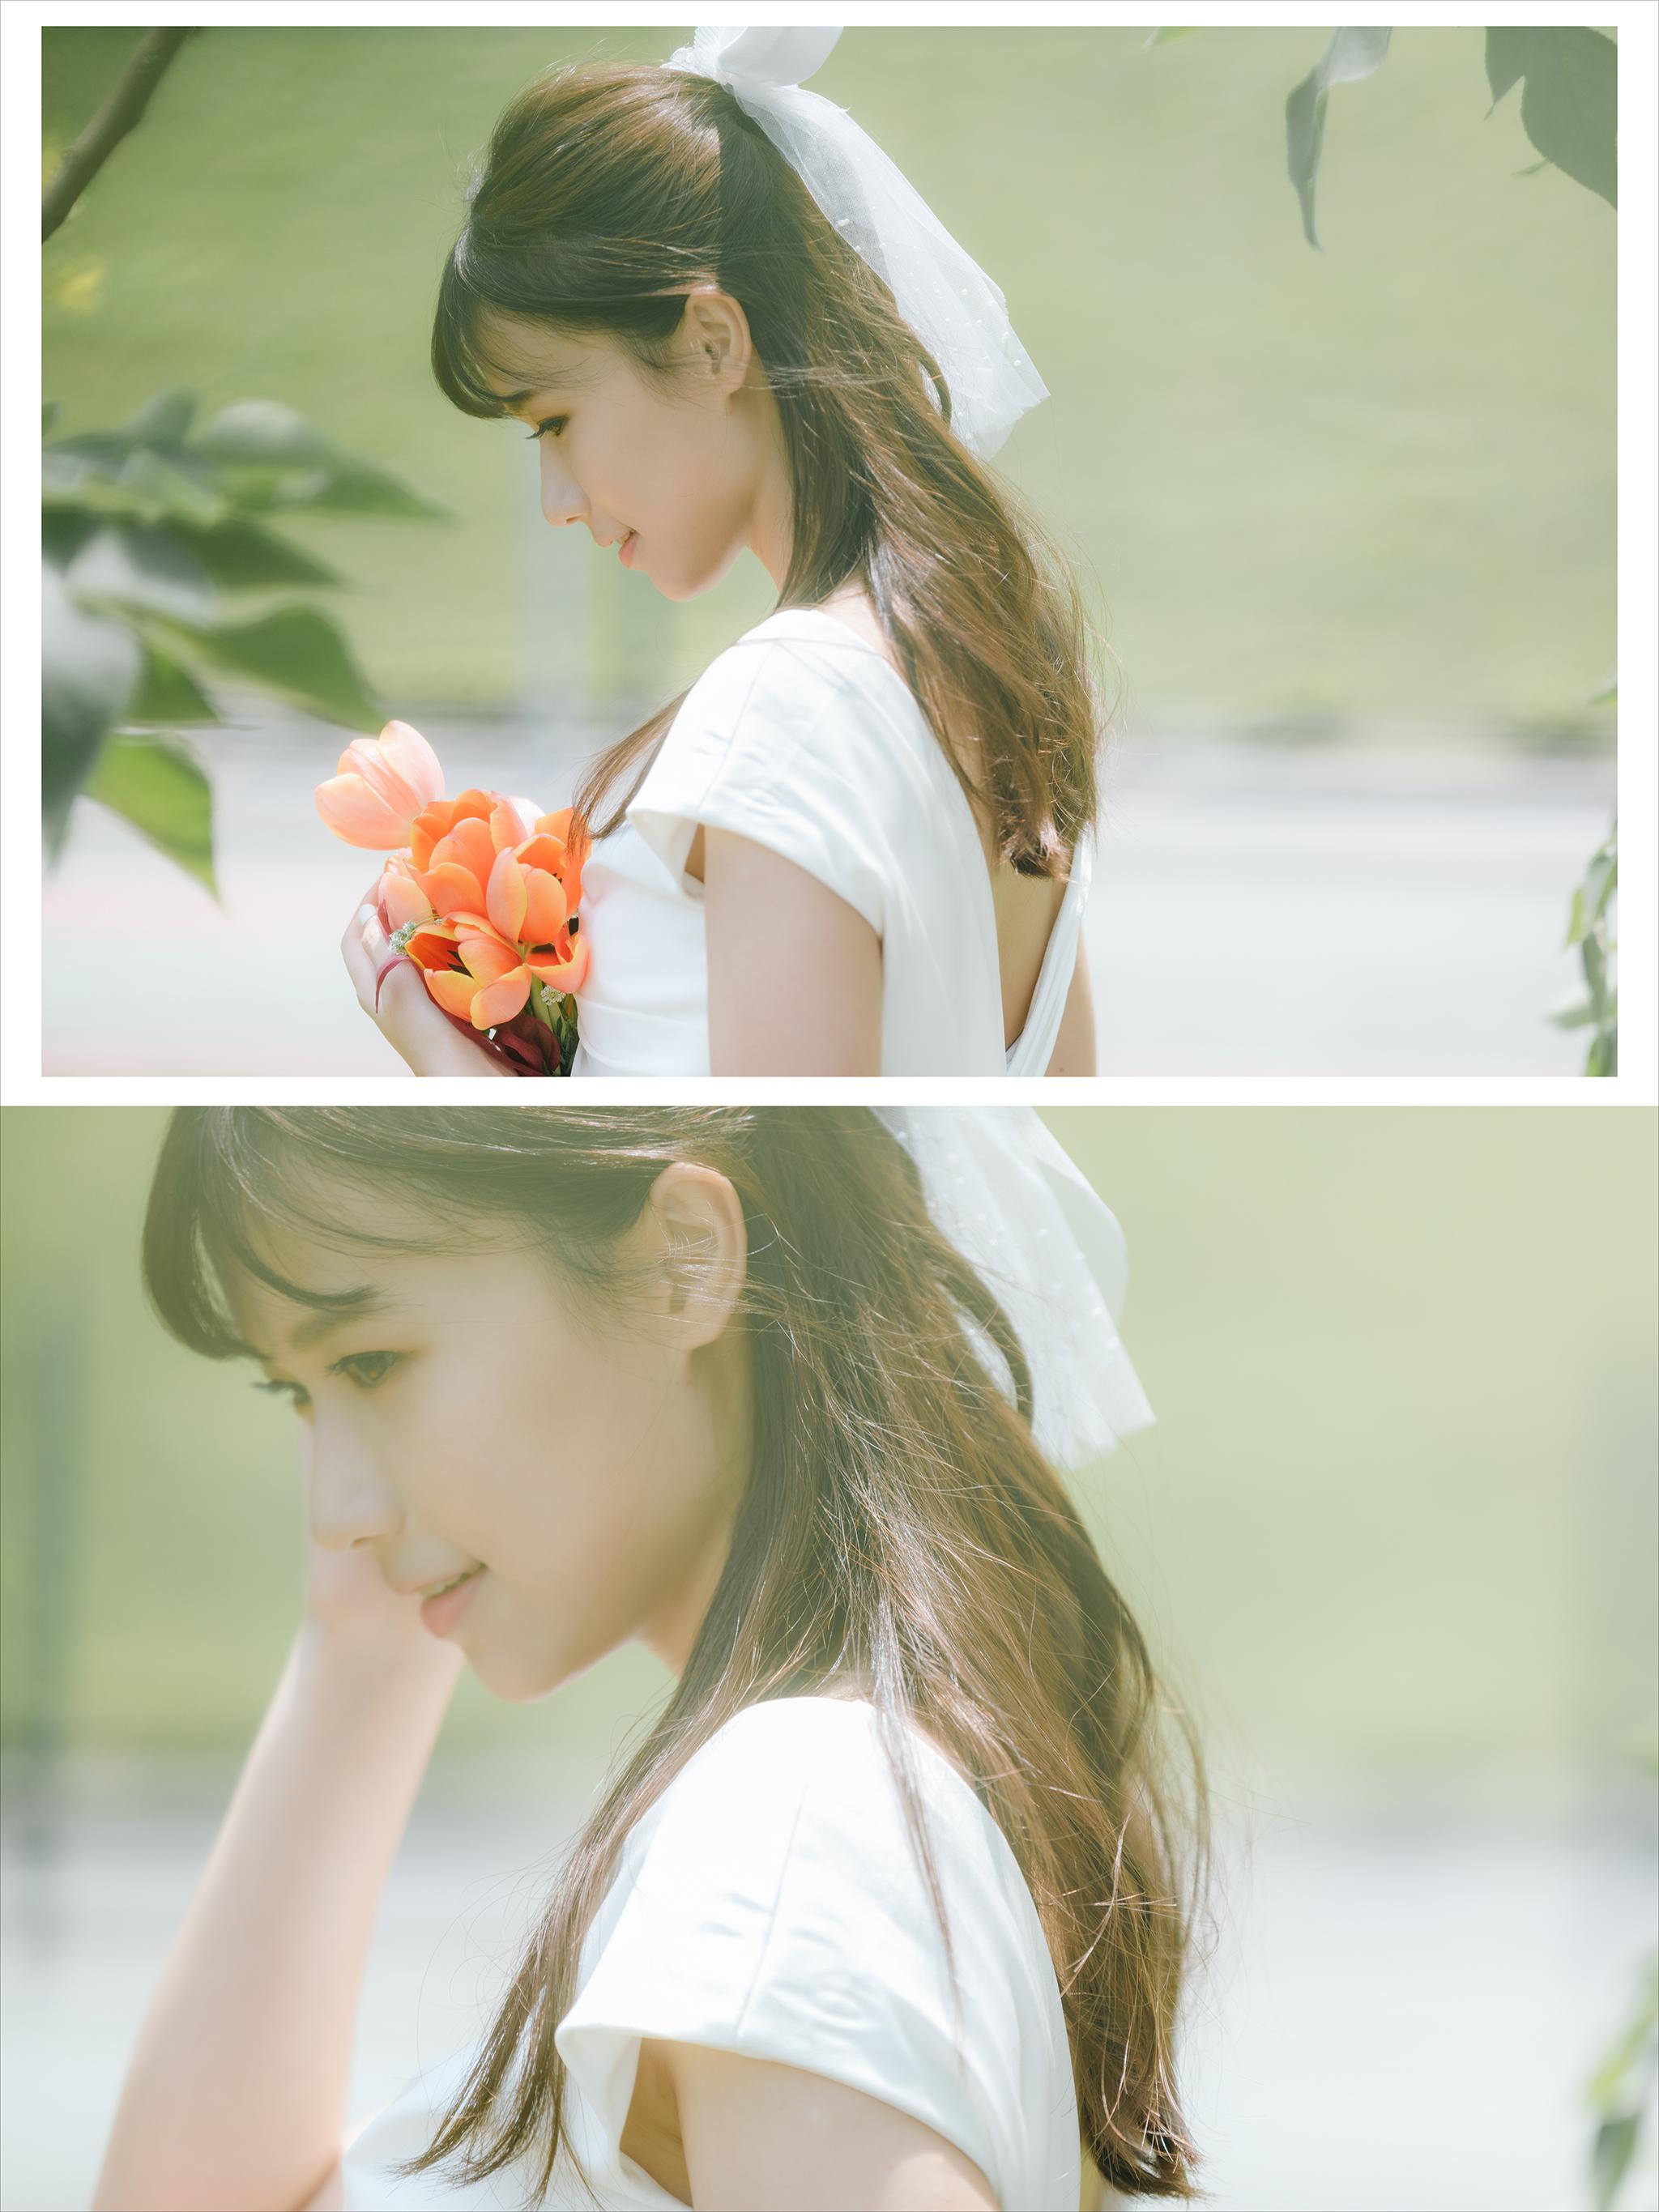 50082281097 0249a7eb41 o - 【自主婚紗】+Mei+